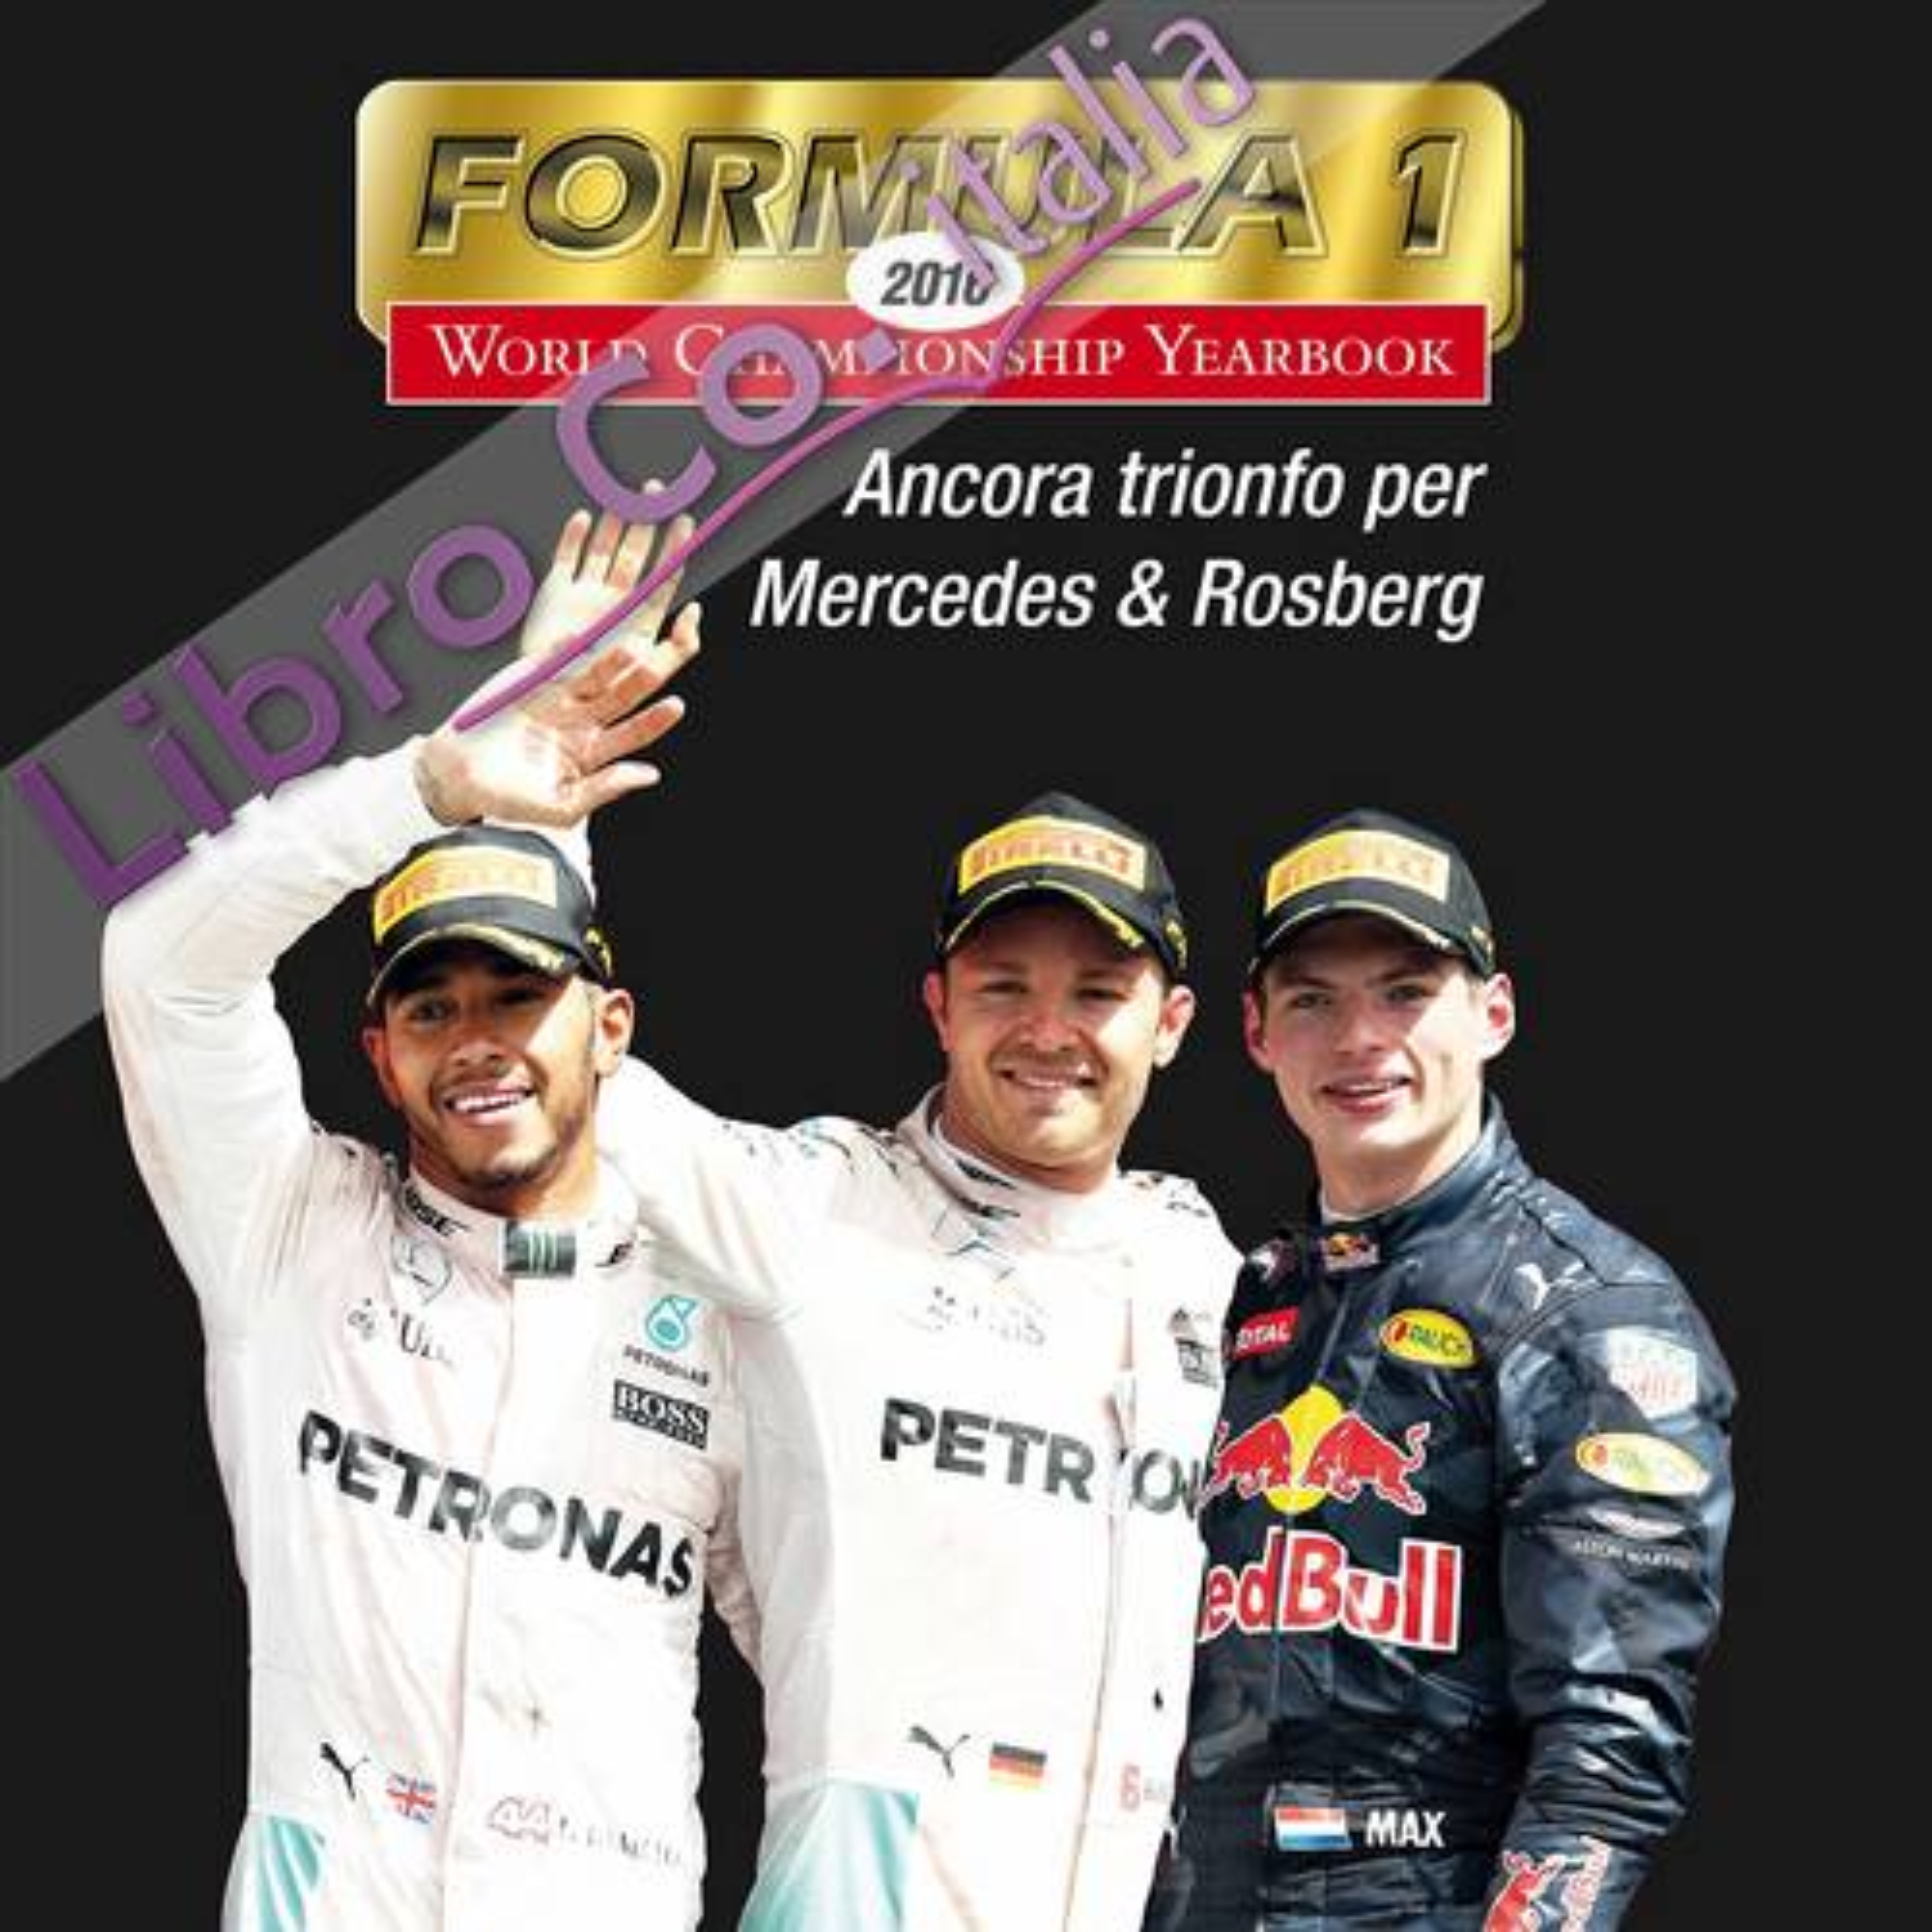 Formula 1. Annuario fotografico del campionato 2016. Ediz. multilingue